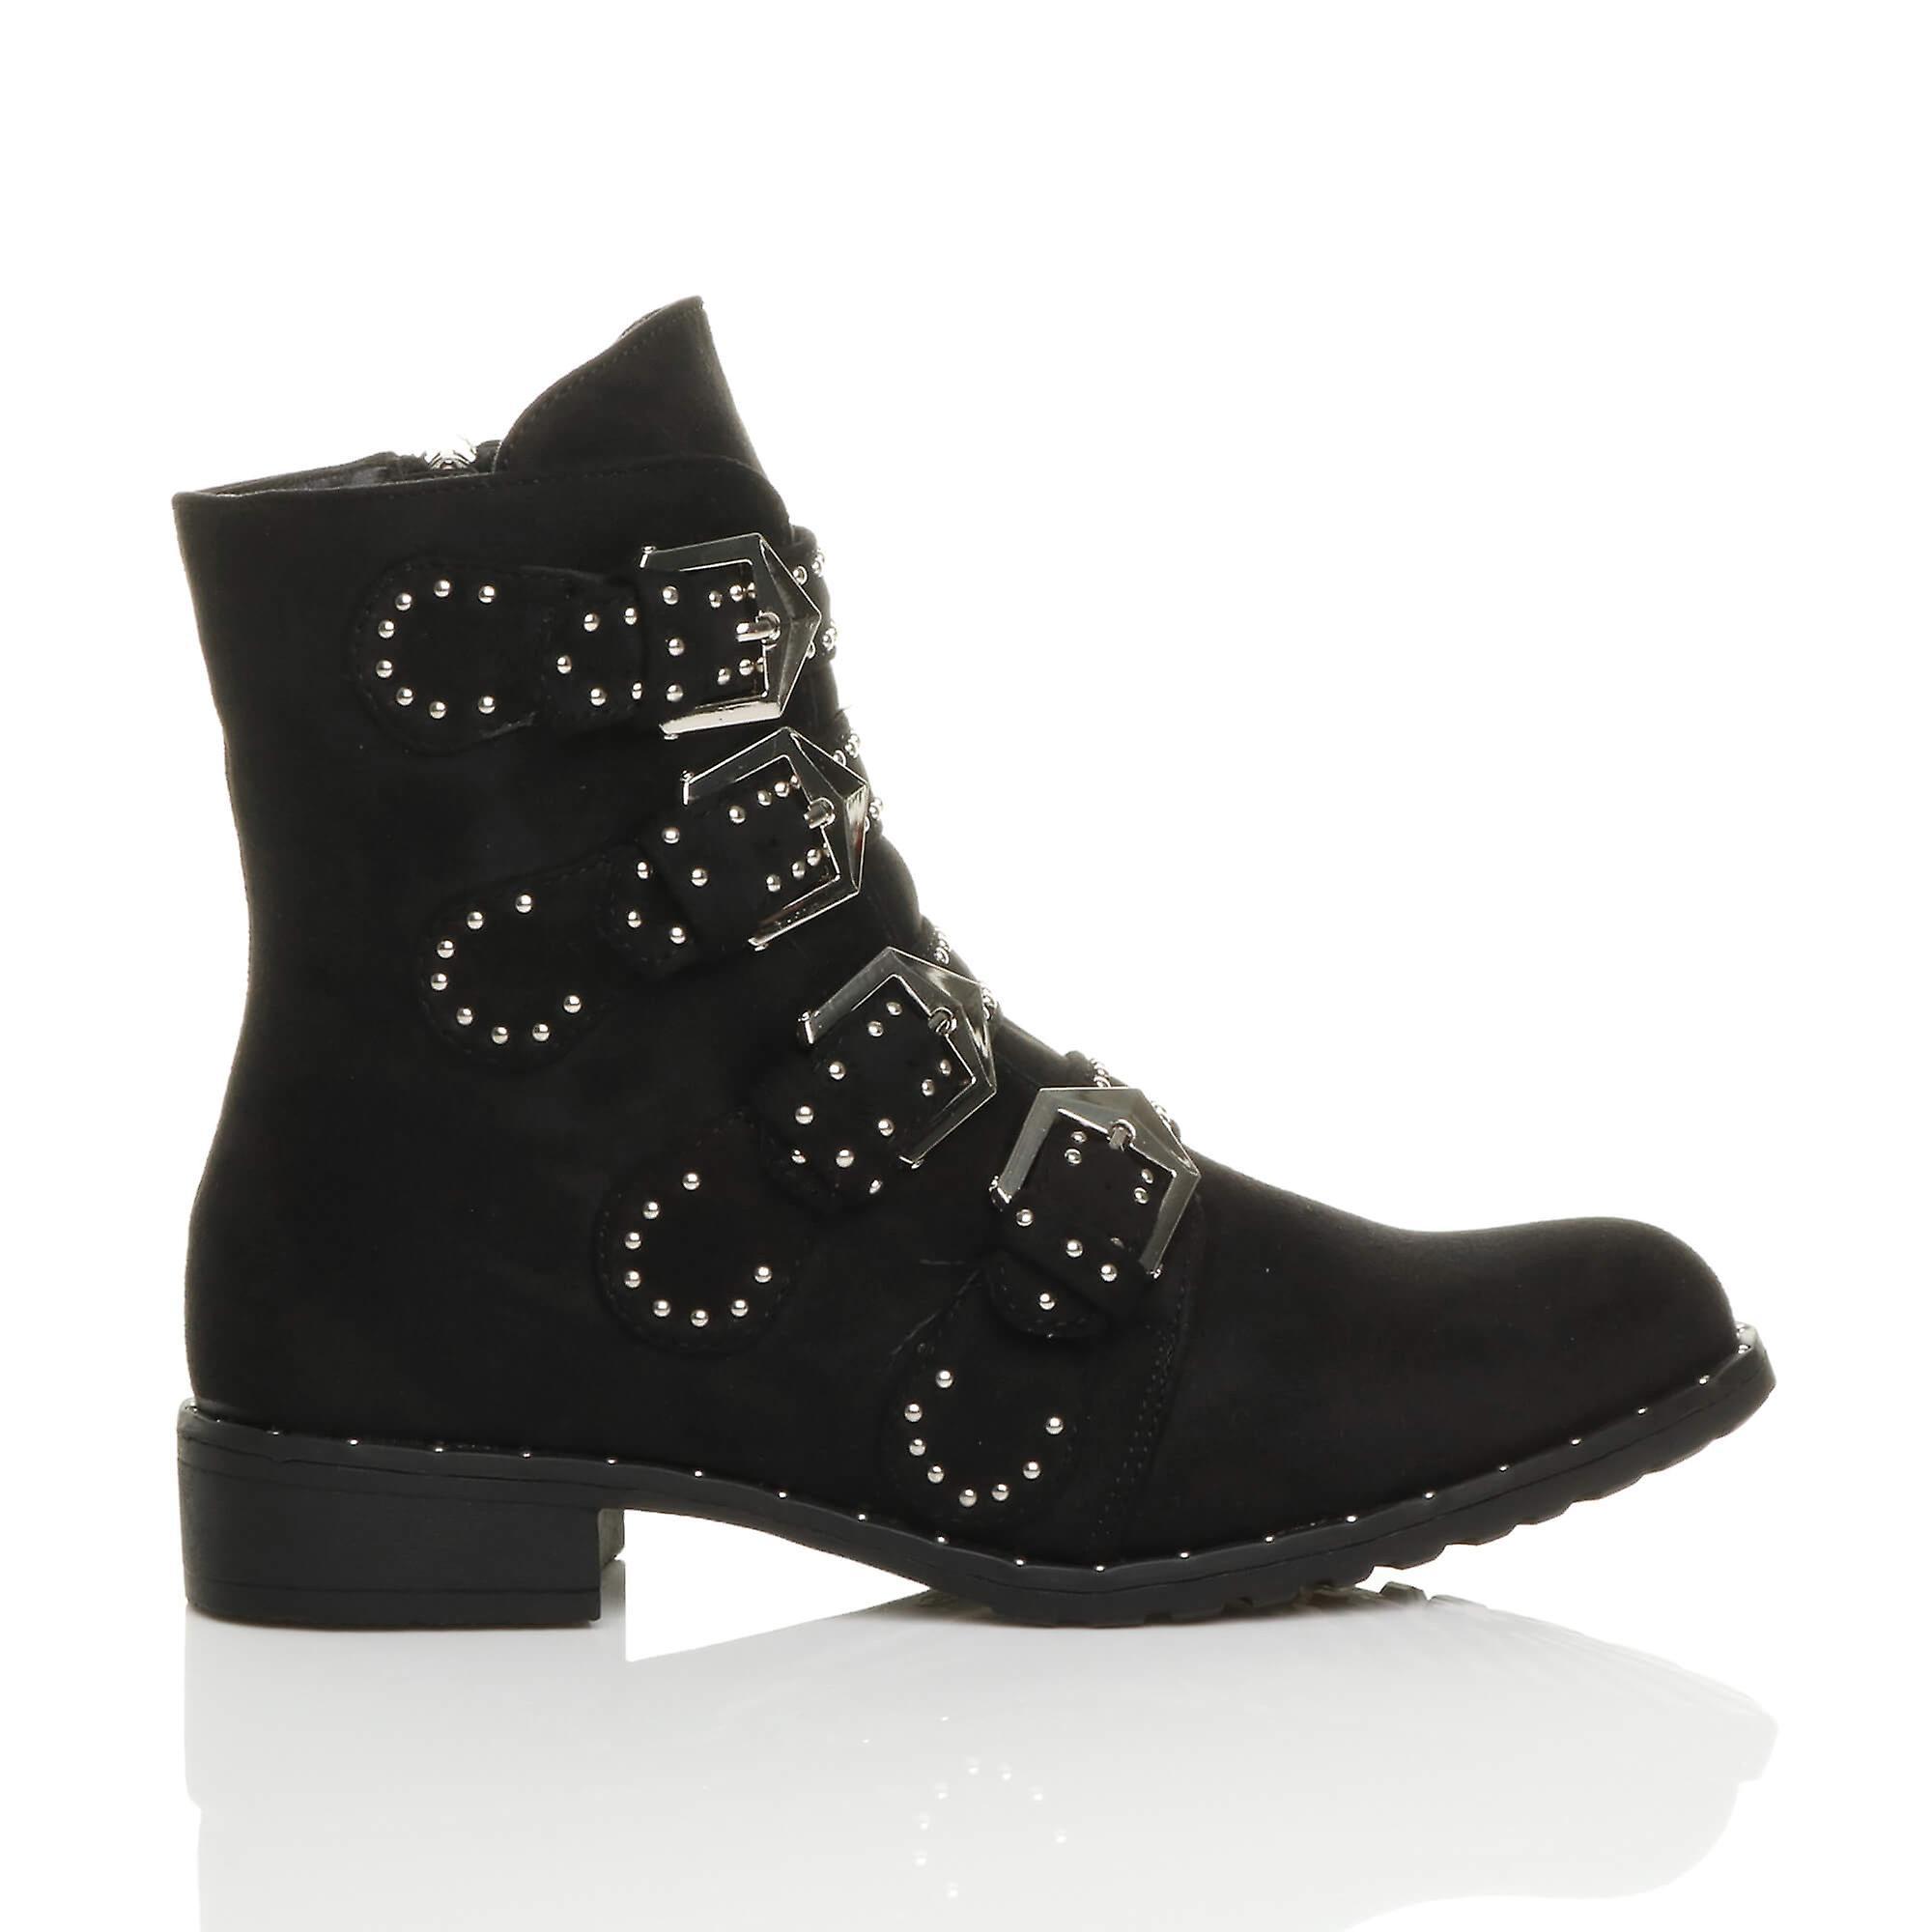 heel buckle western block biker womens studded low Ajvani boots strap ankle UwXqtPOKx